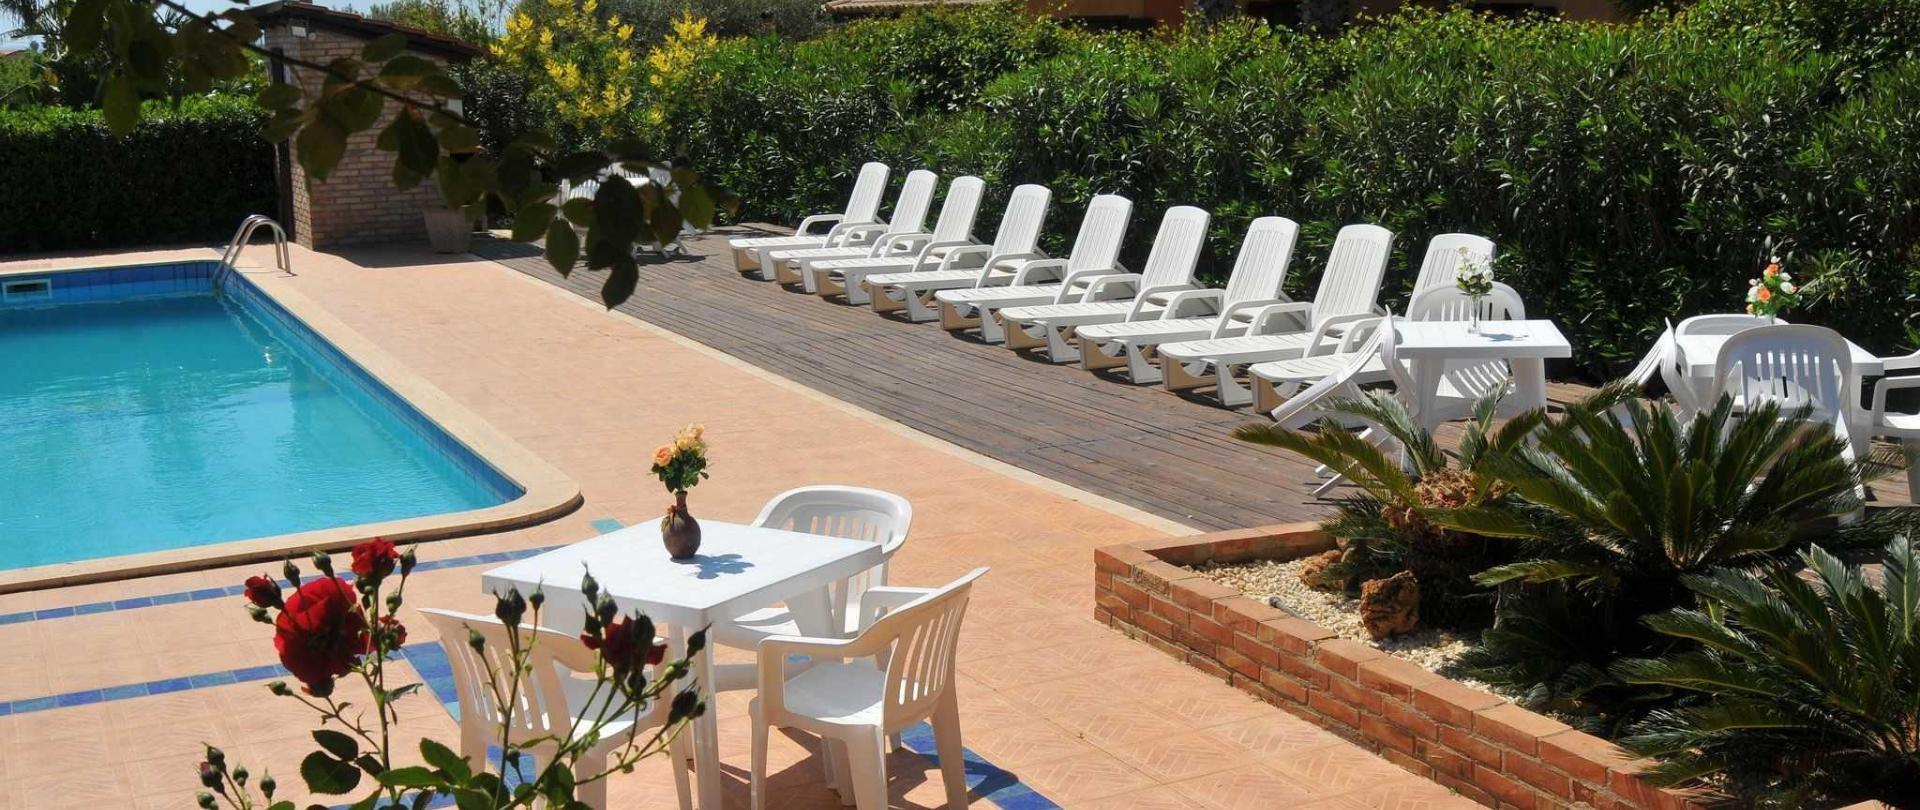 5_resort_noto_il_mandorleto_avola_villa_con_piscina_campagna_siciliana_16.JPG